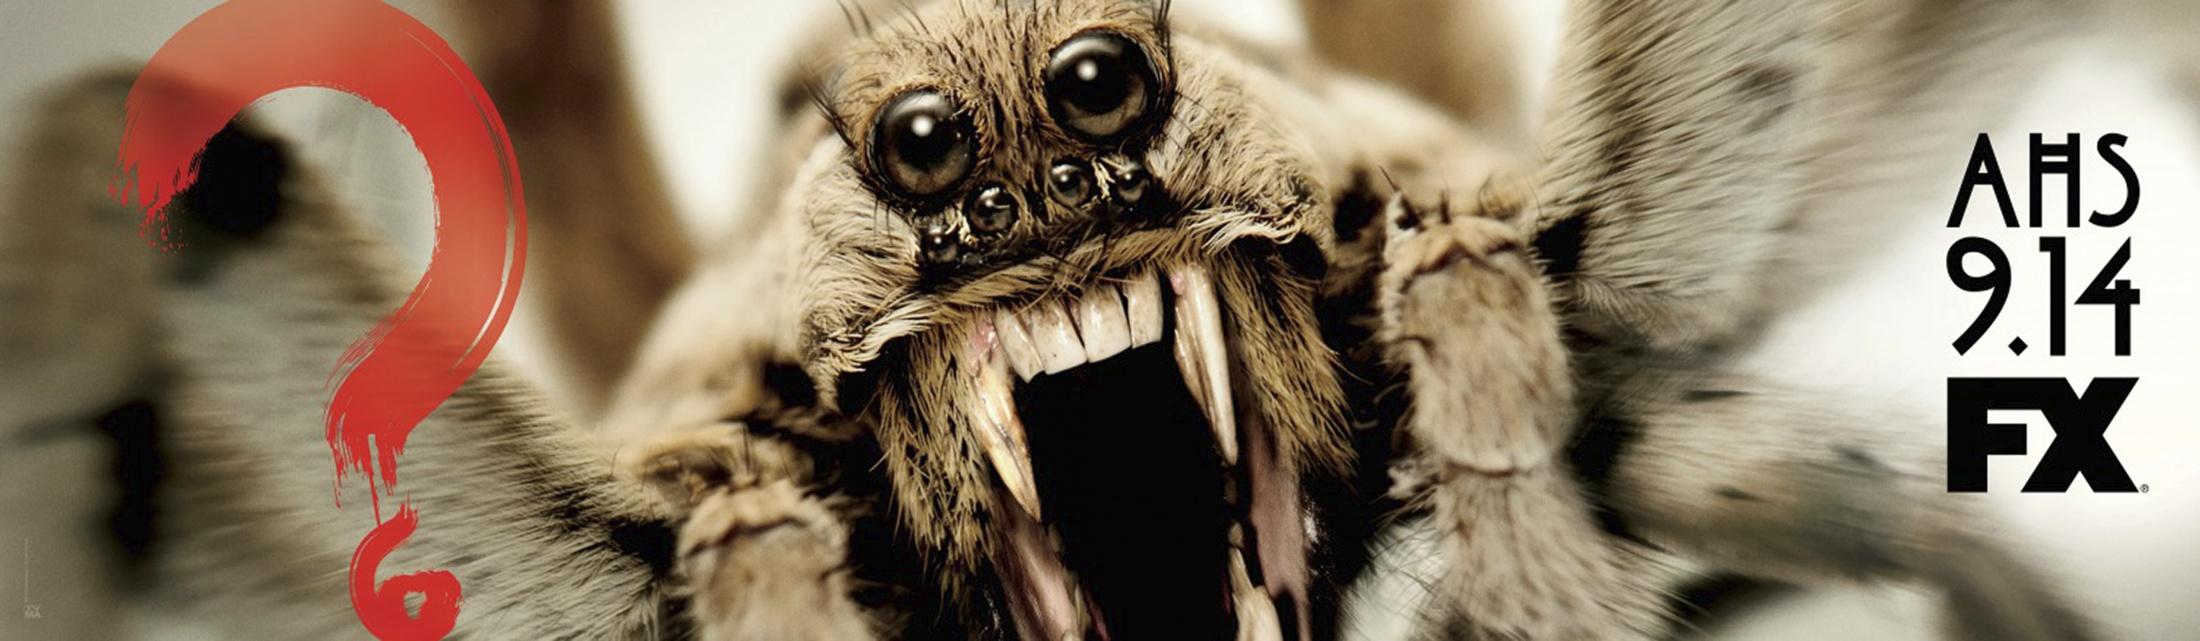 Thumbnail for American Horror Story - Roanoke teaser billboard (wolf spider)